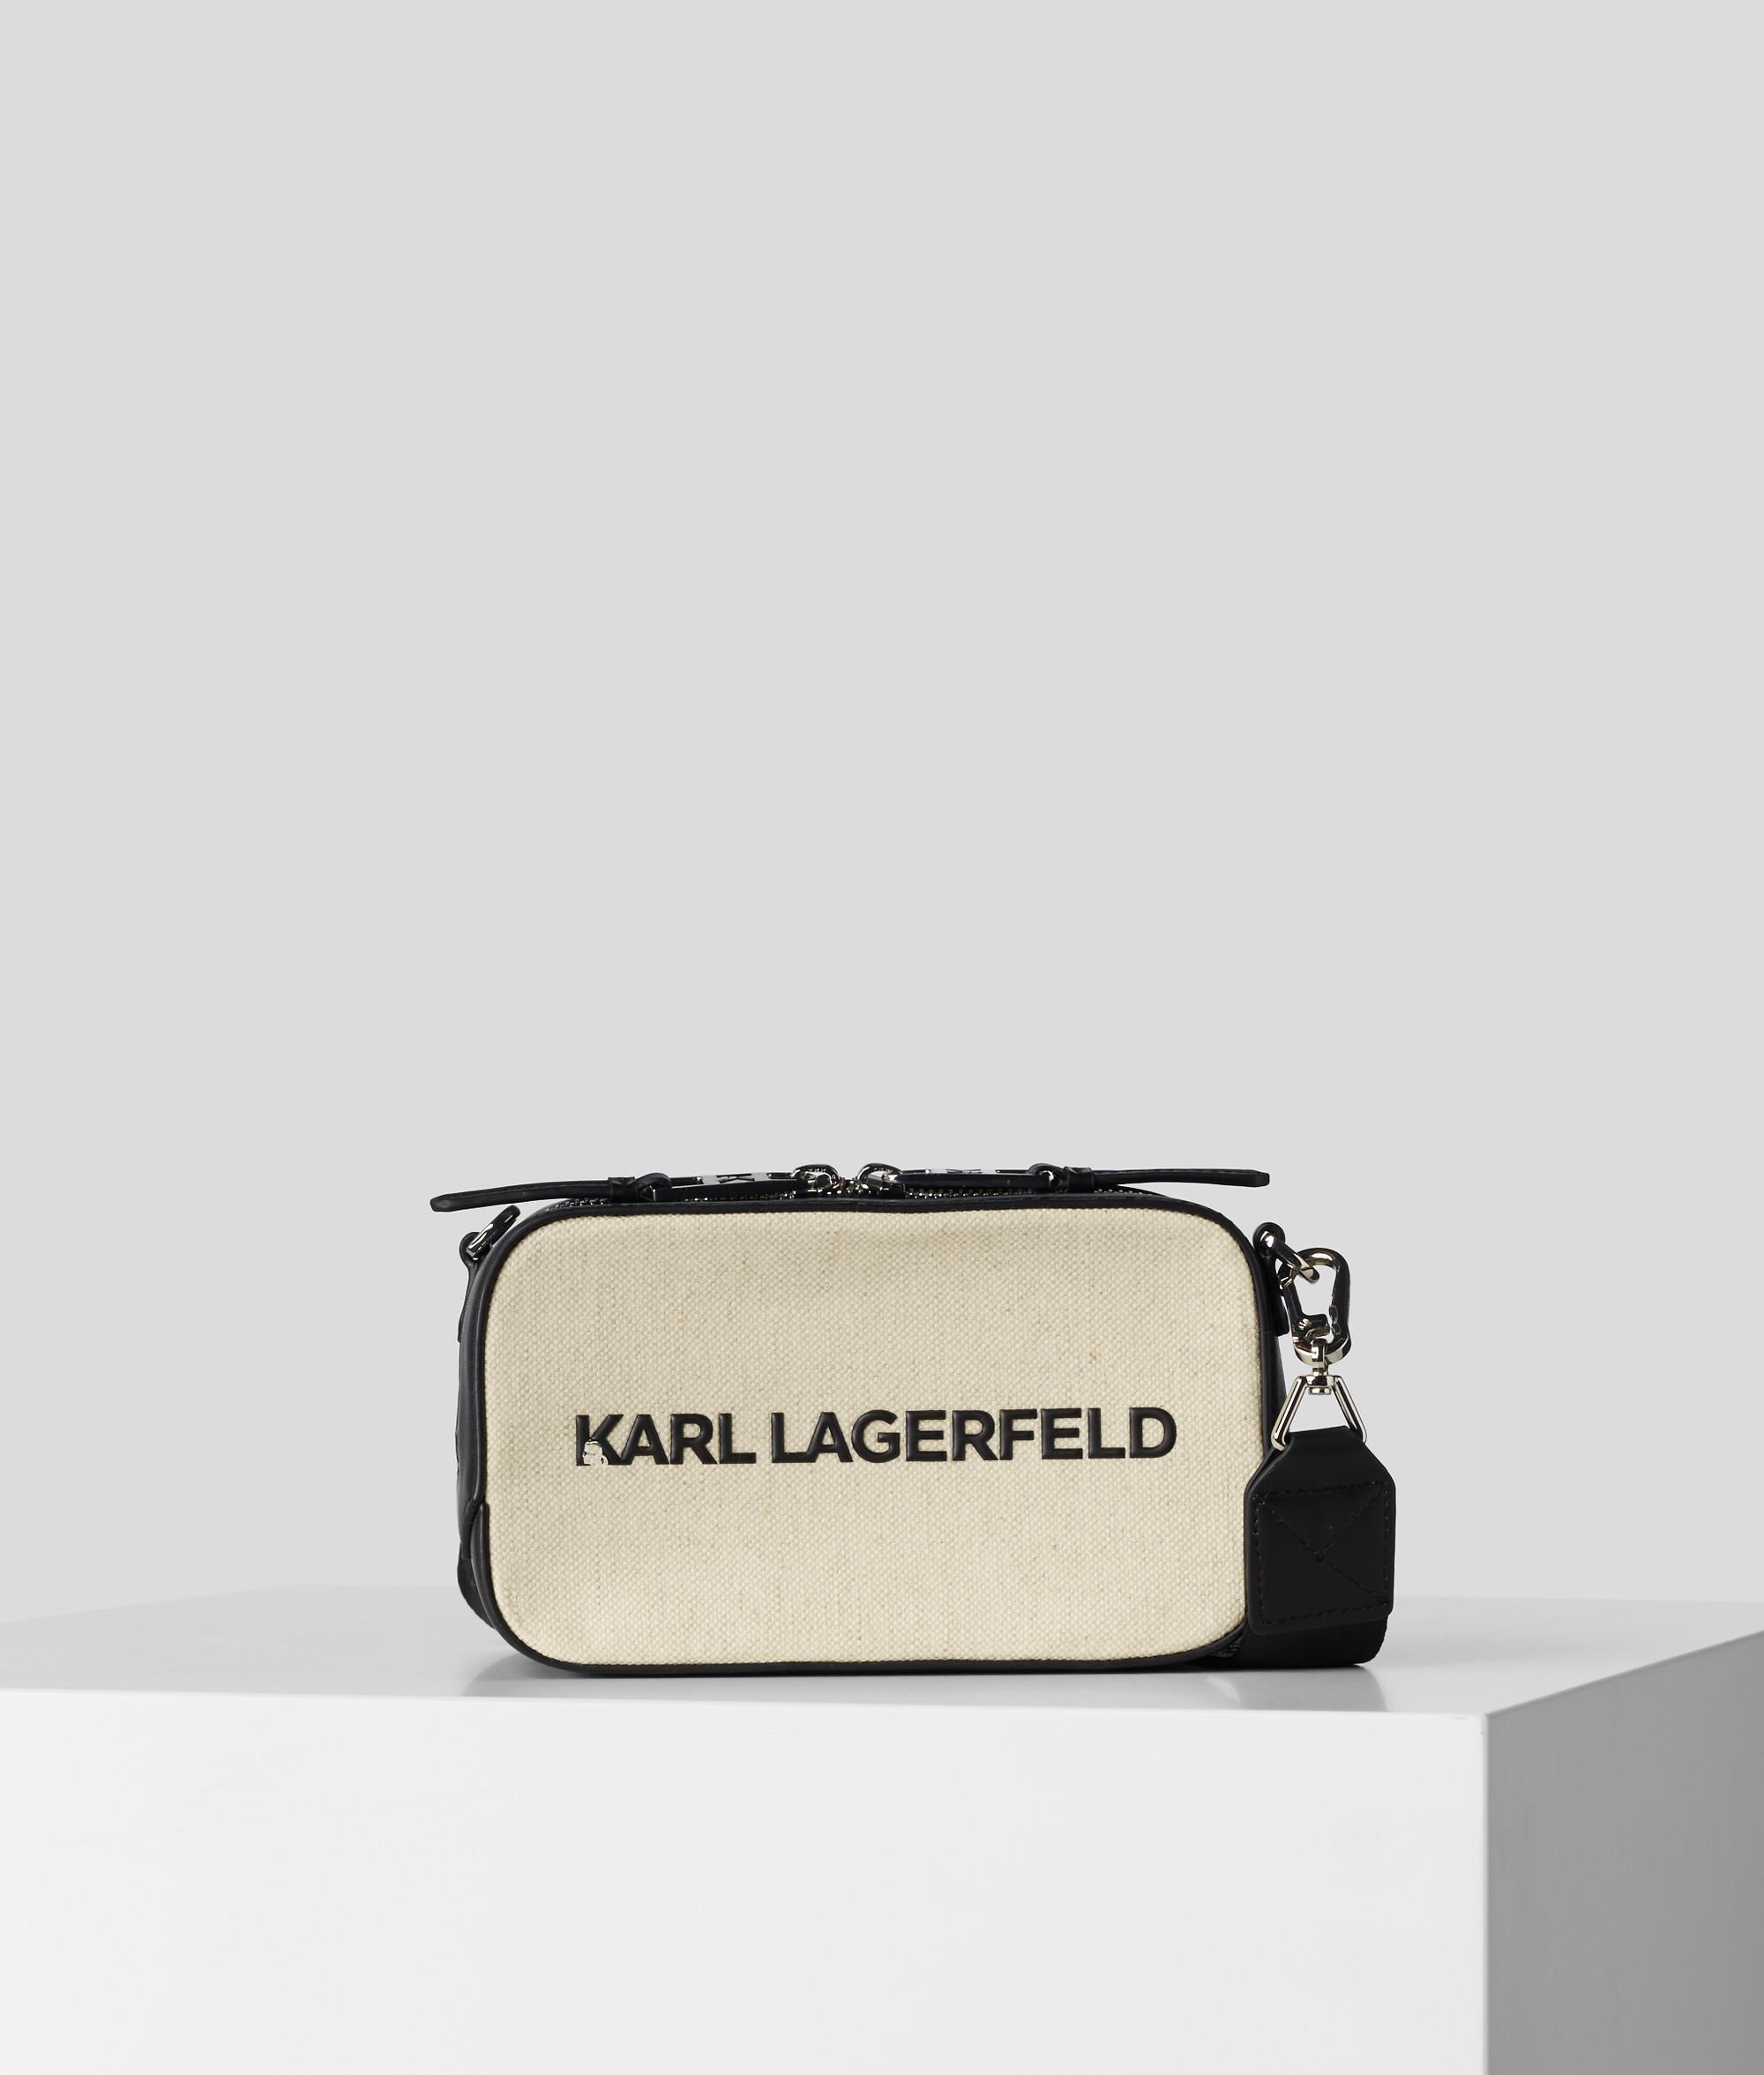 Karl Lagerfeld Skuare Canvas Camera crossover